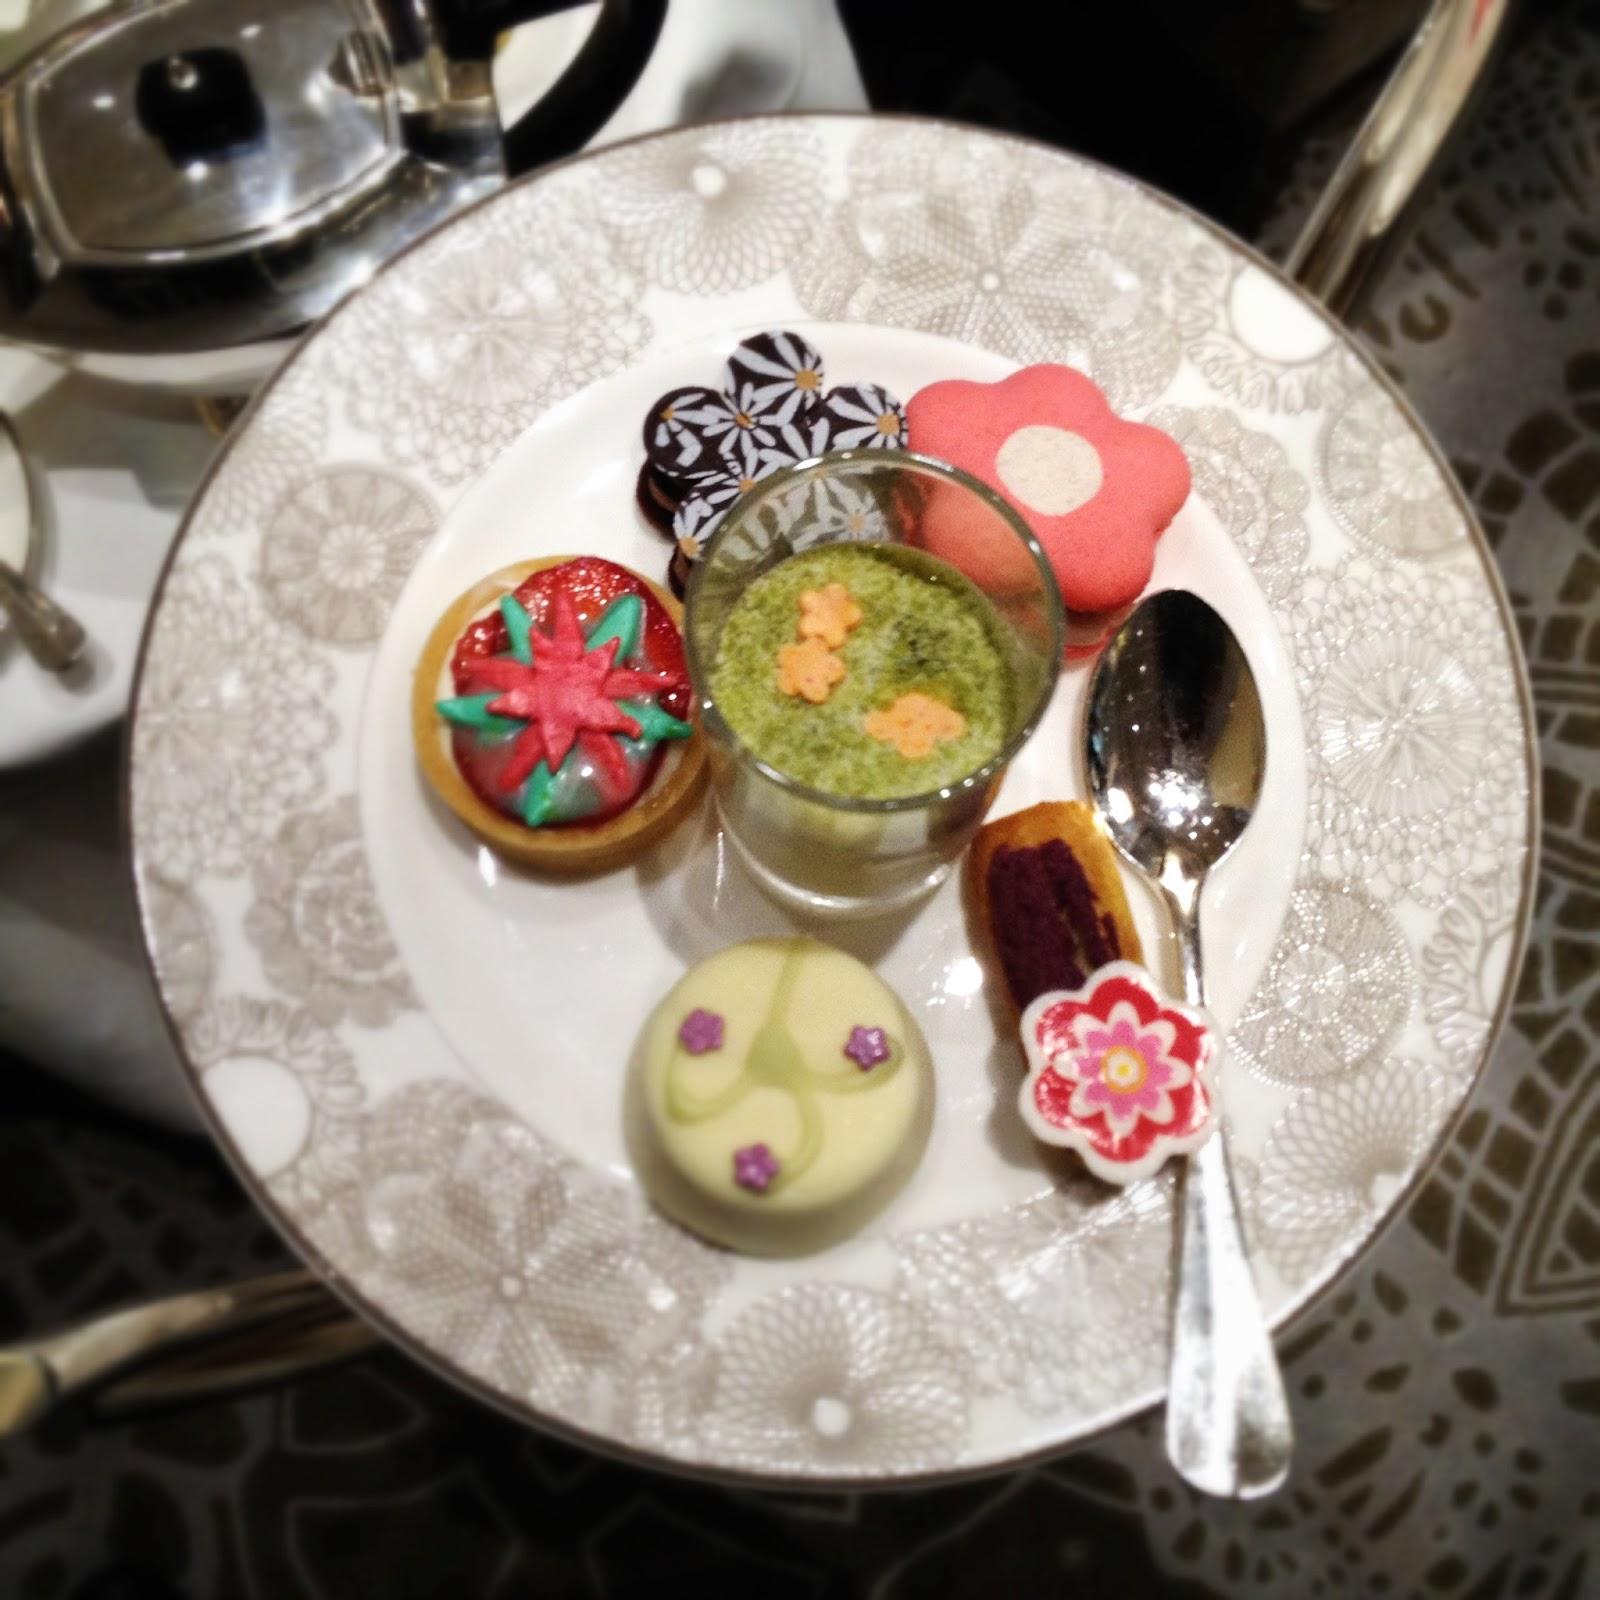 Edible Scottish Cake Decorations